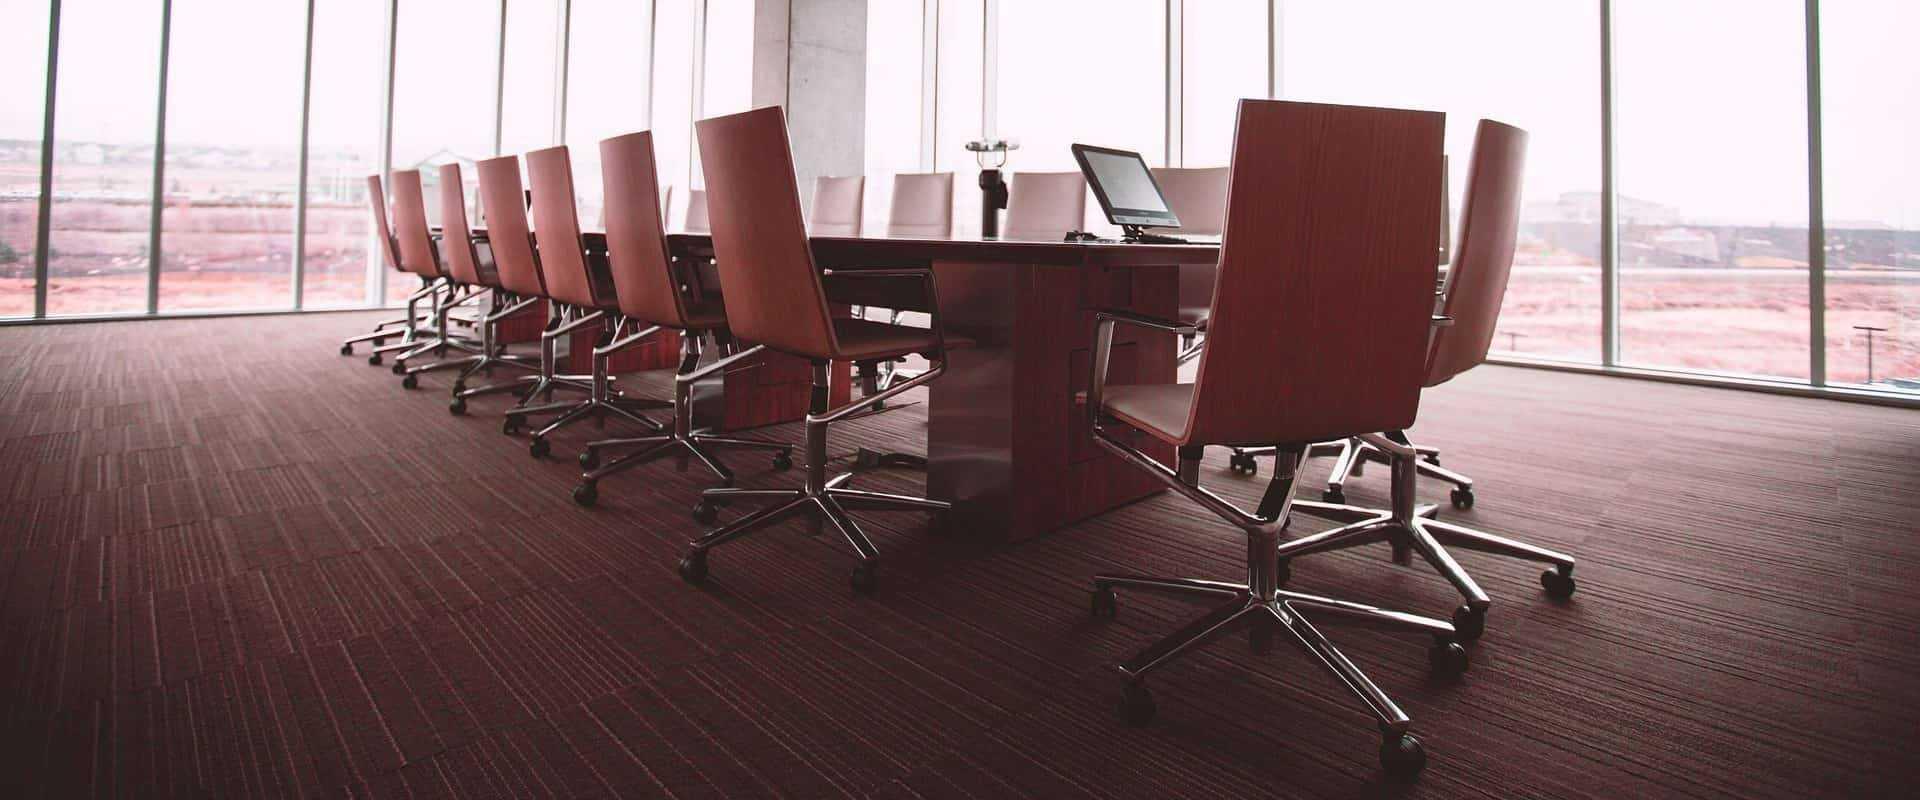 Transport Software für Möbel Großhandel